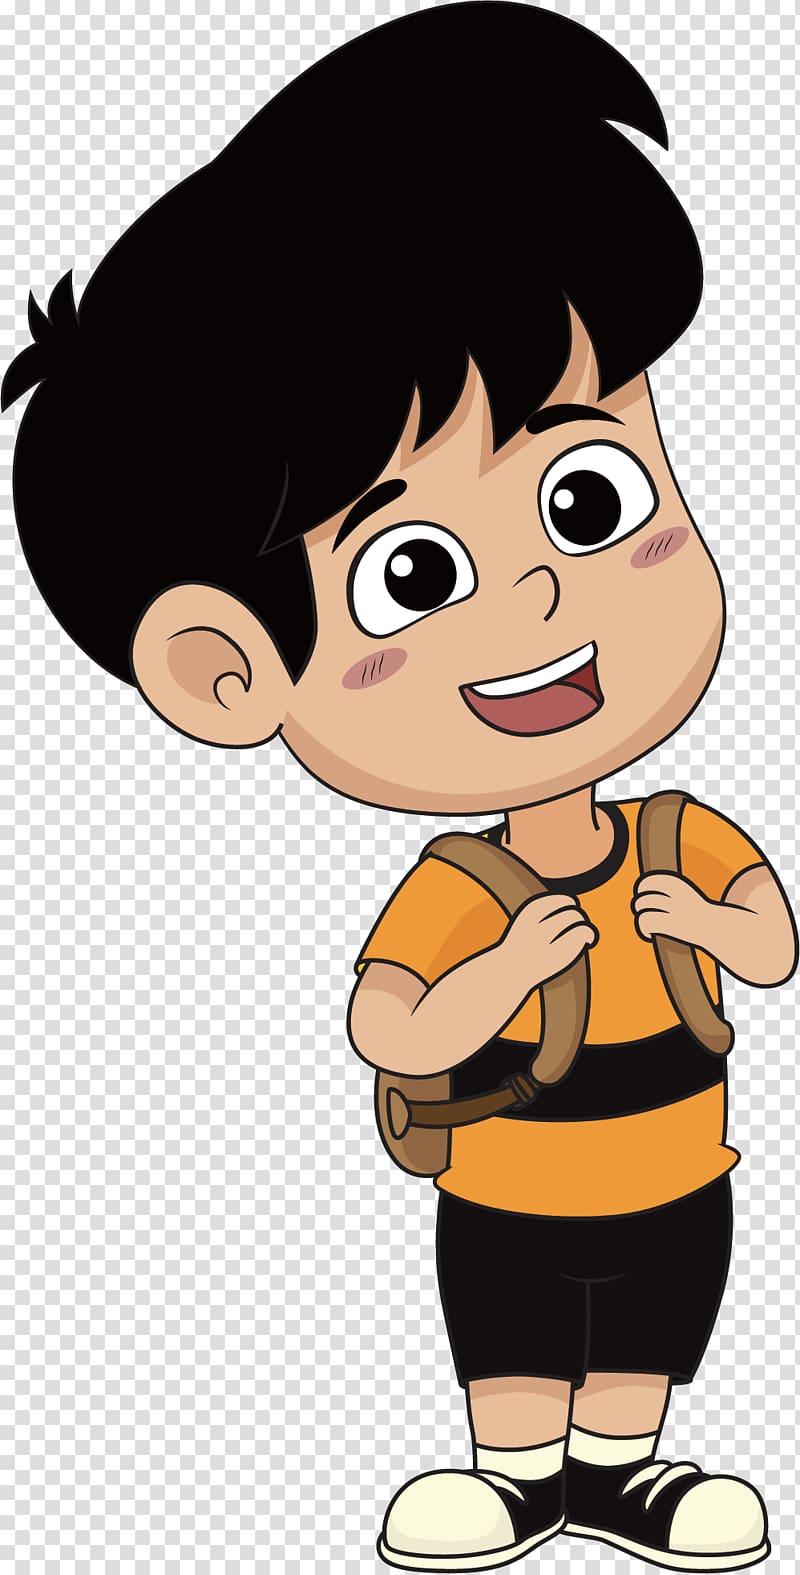 Boy wearing backpack illustration, Cartoon Illustration.